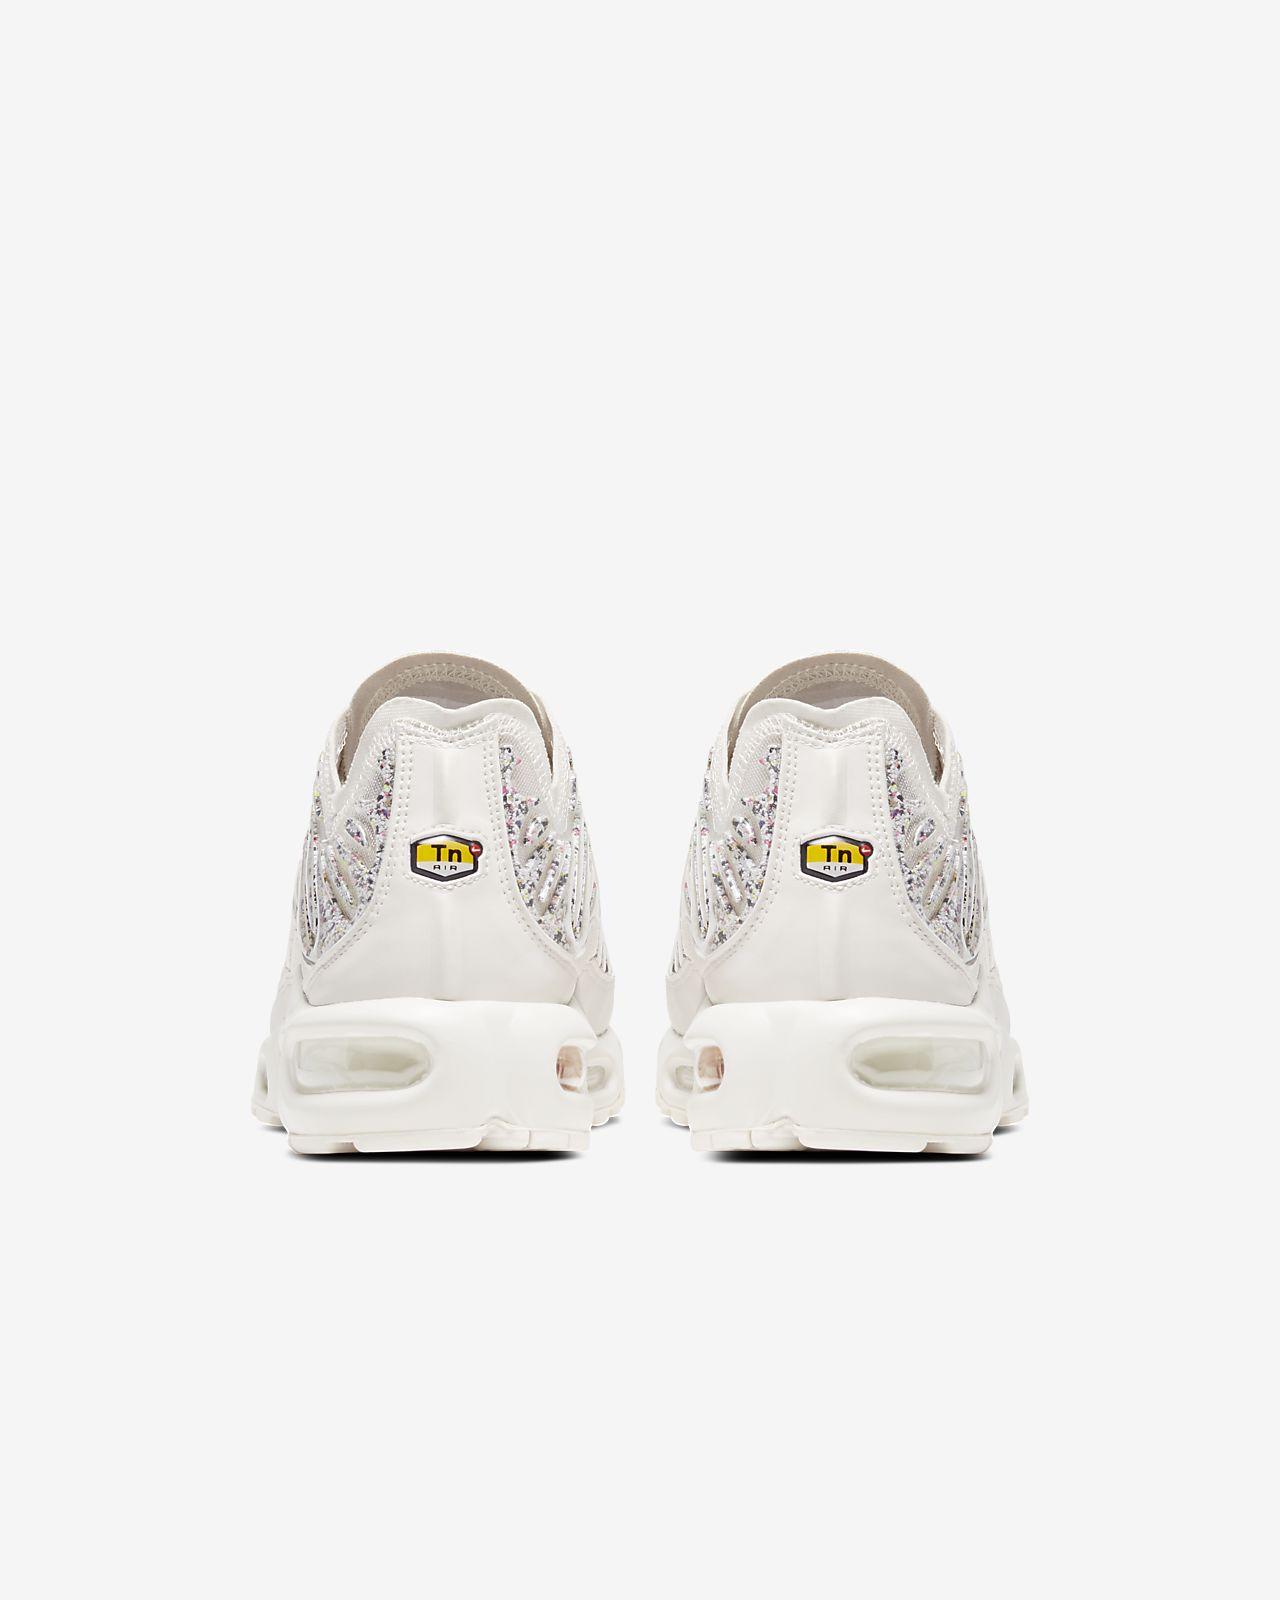 Nike Air Max Plus LX Women's Shoe. Nike EG